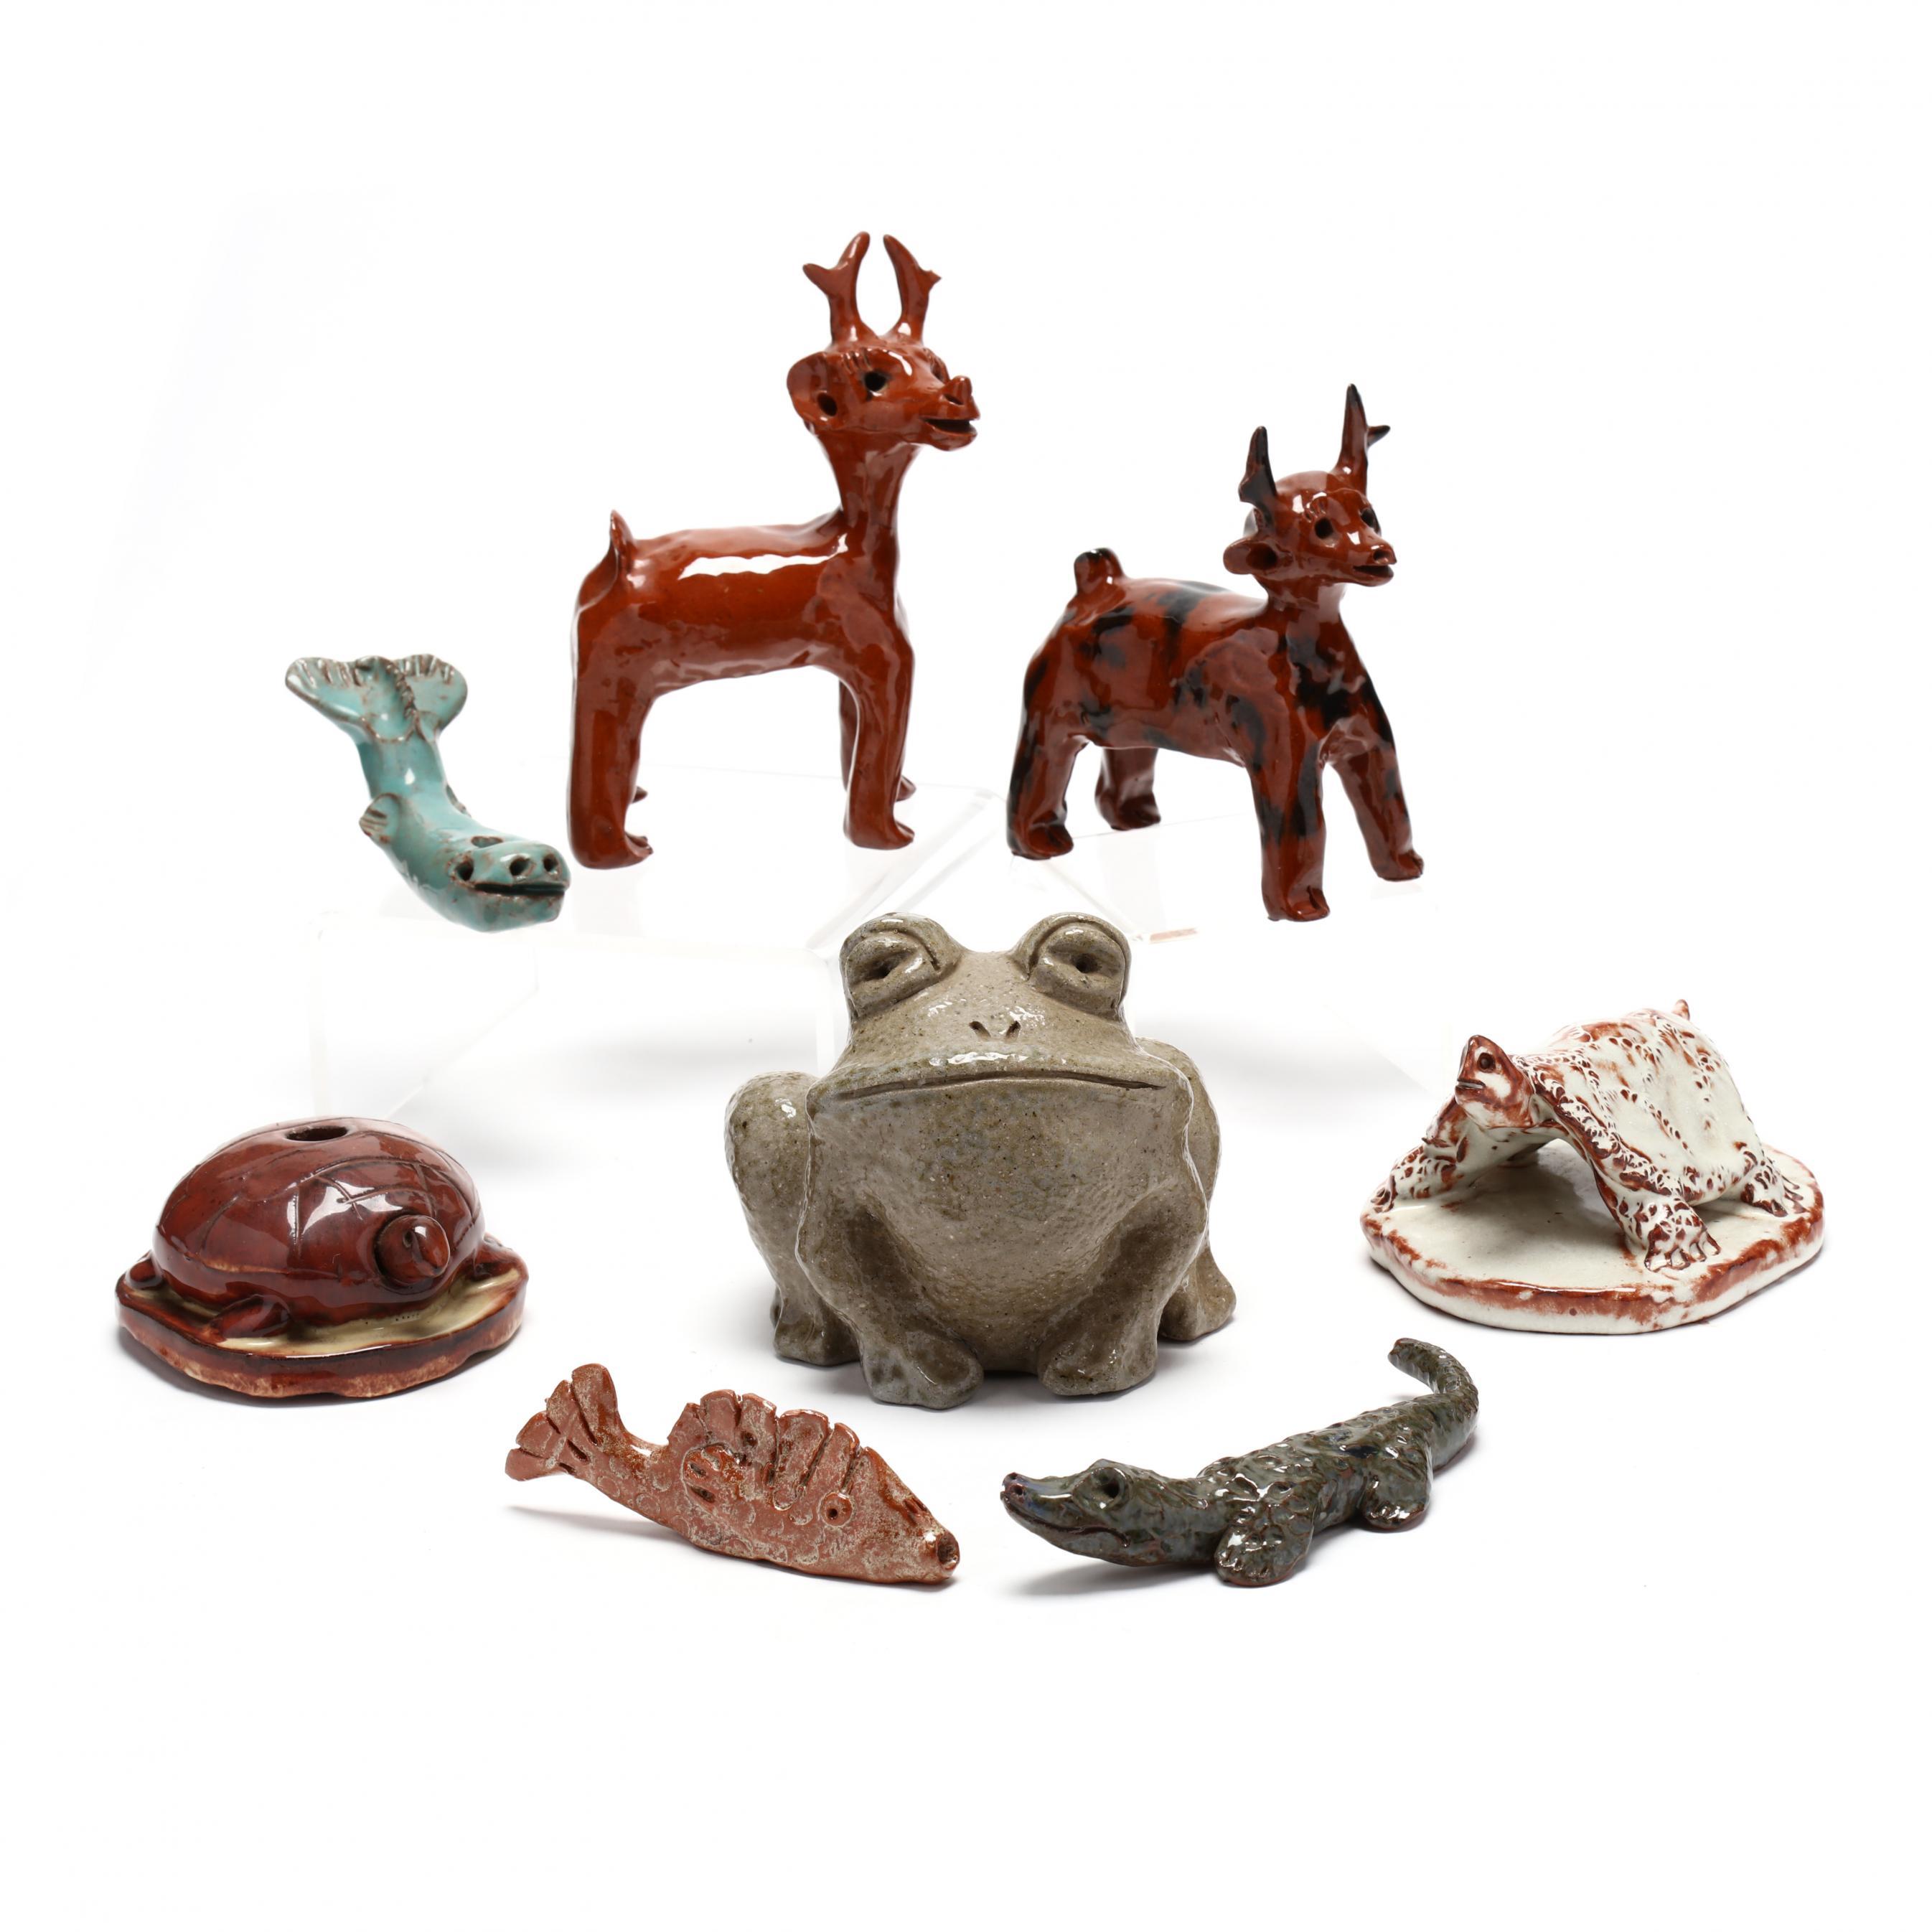 nc-folk-pottery-eight-vintage-molded-animals-jb-cole-and-jugtown